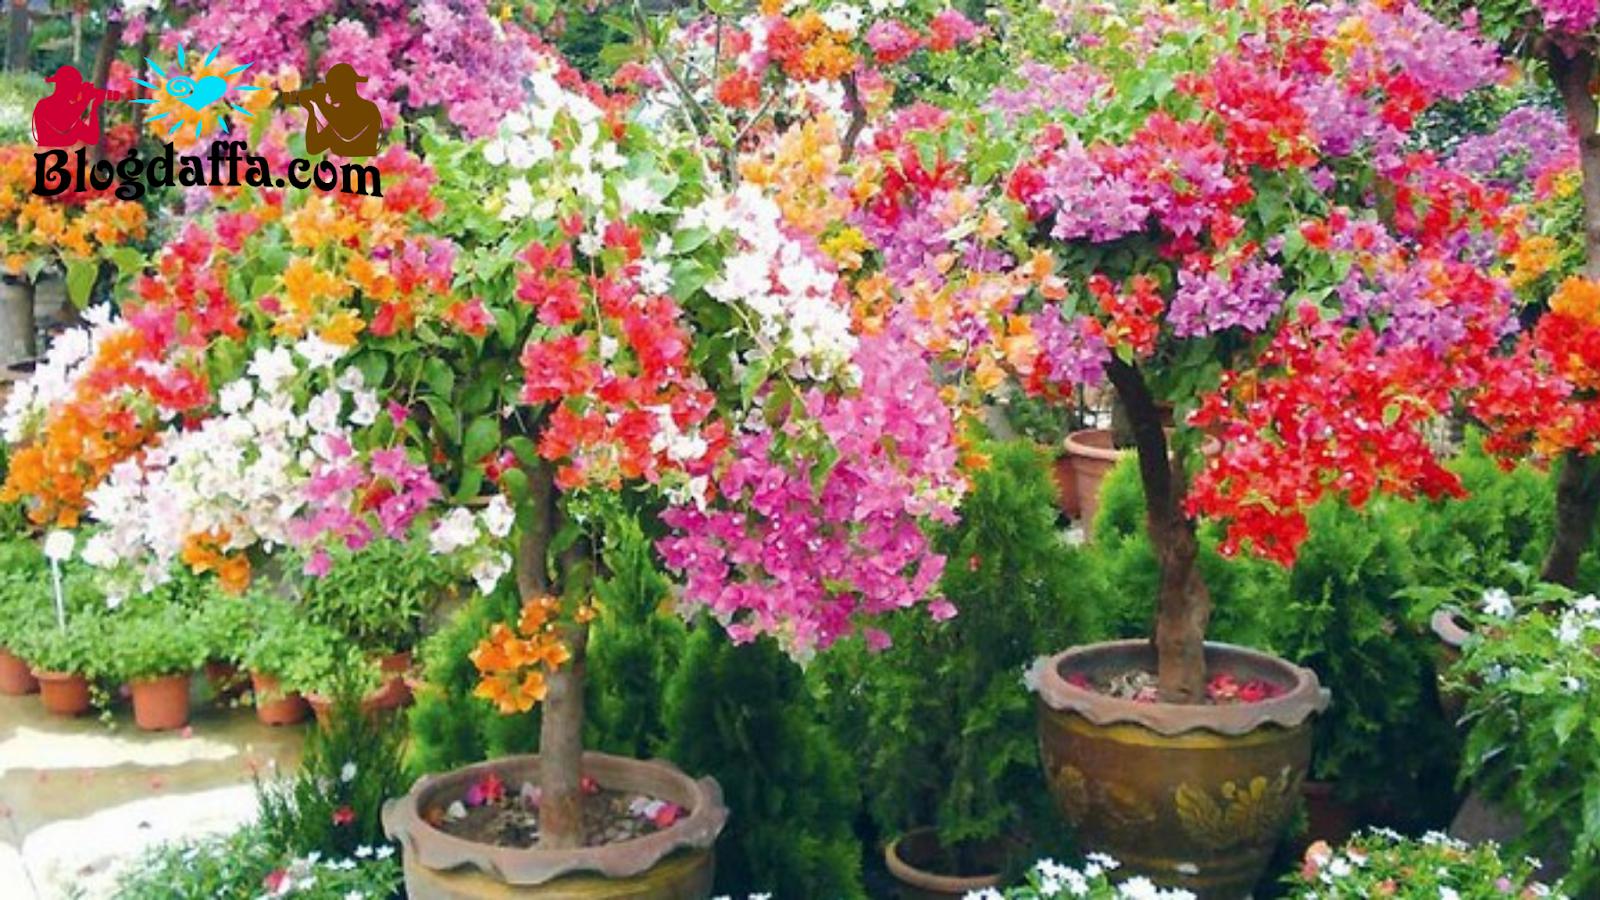 Cara Menanam Bunga Kertas dengan Sambung Pucuk